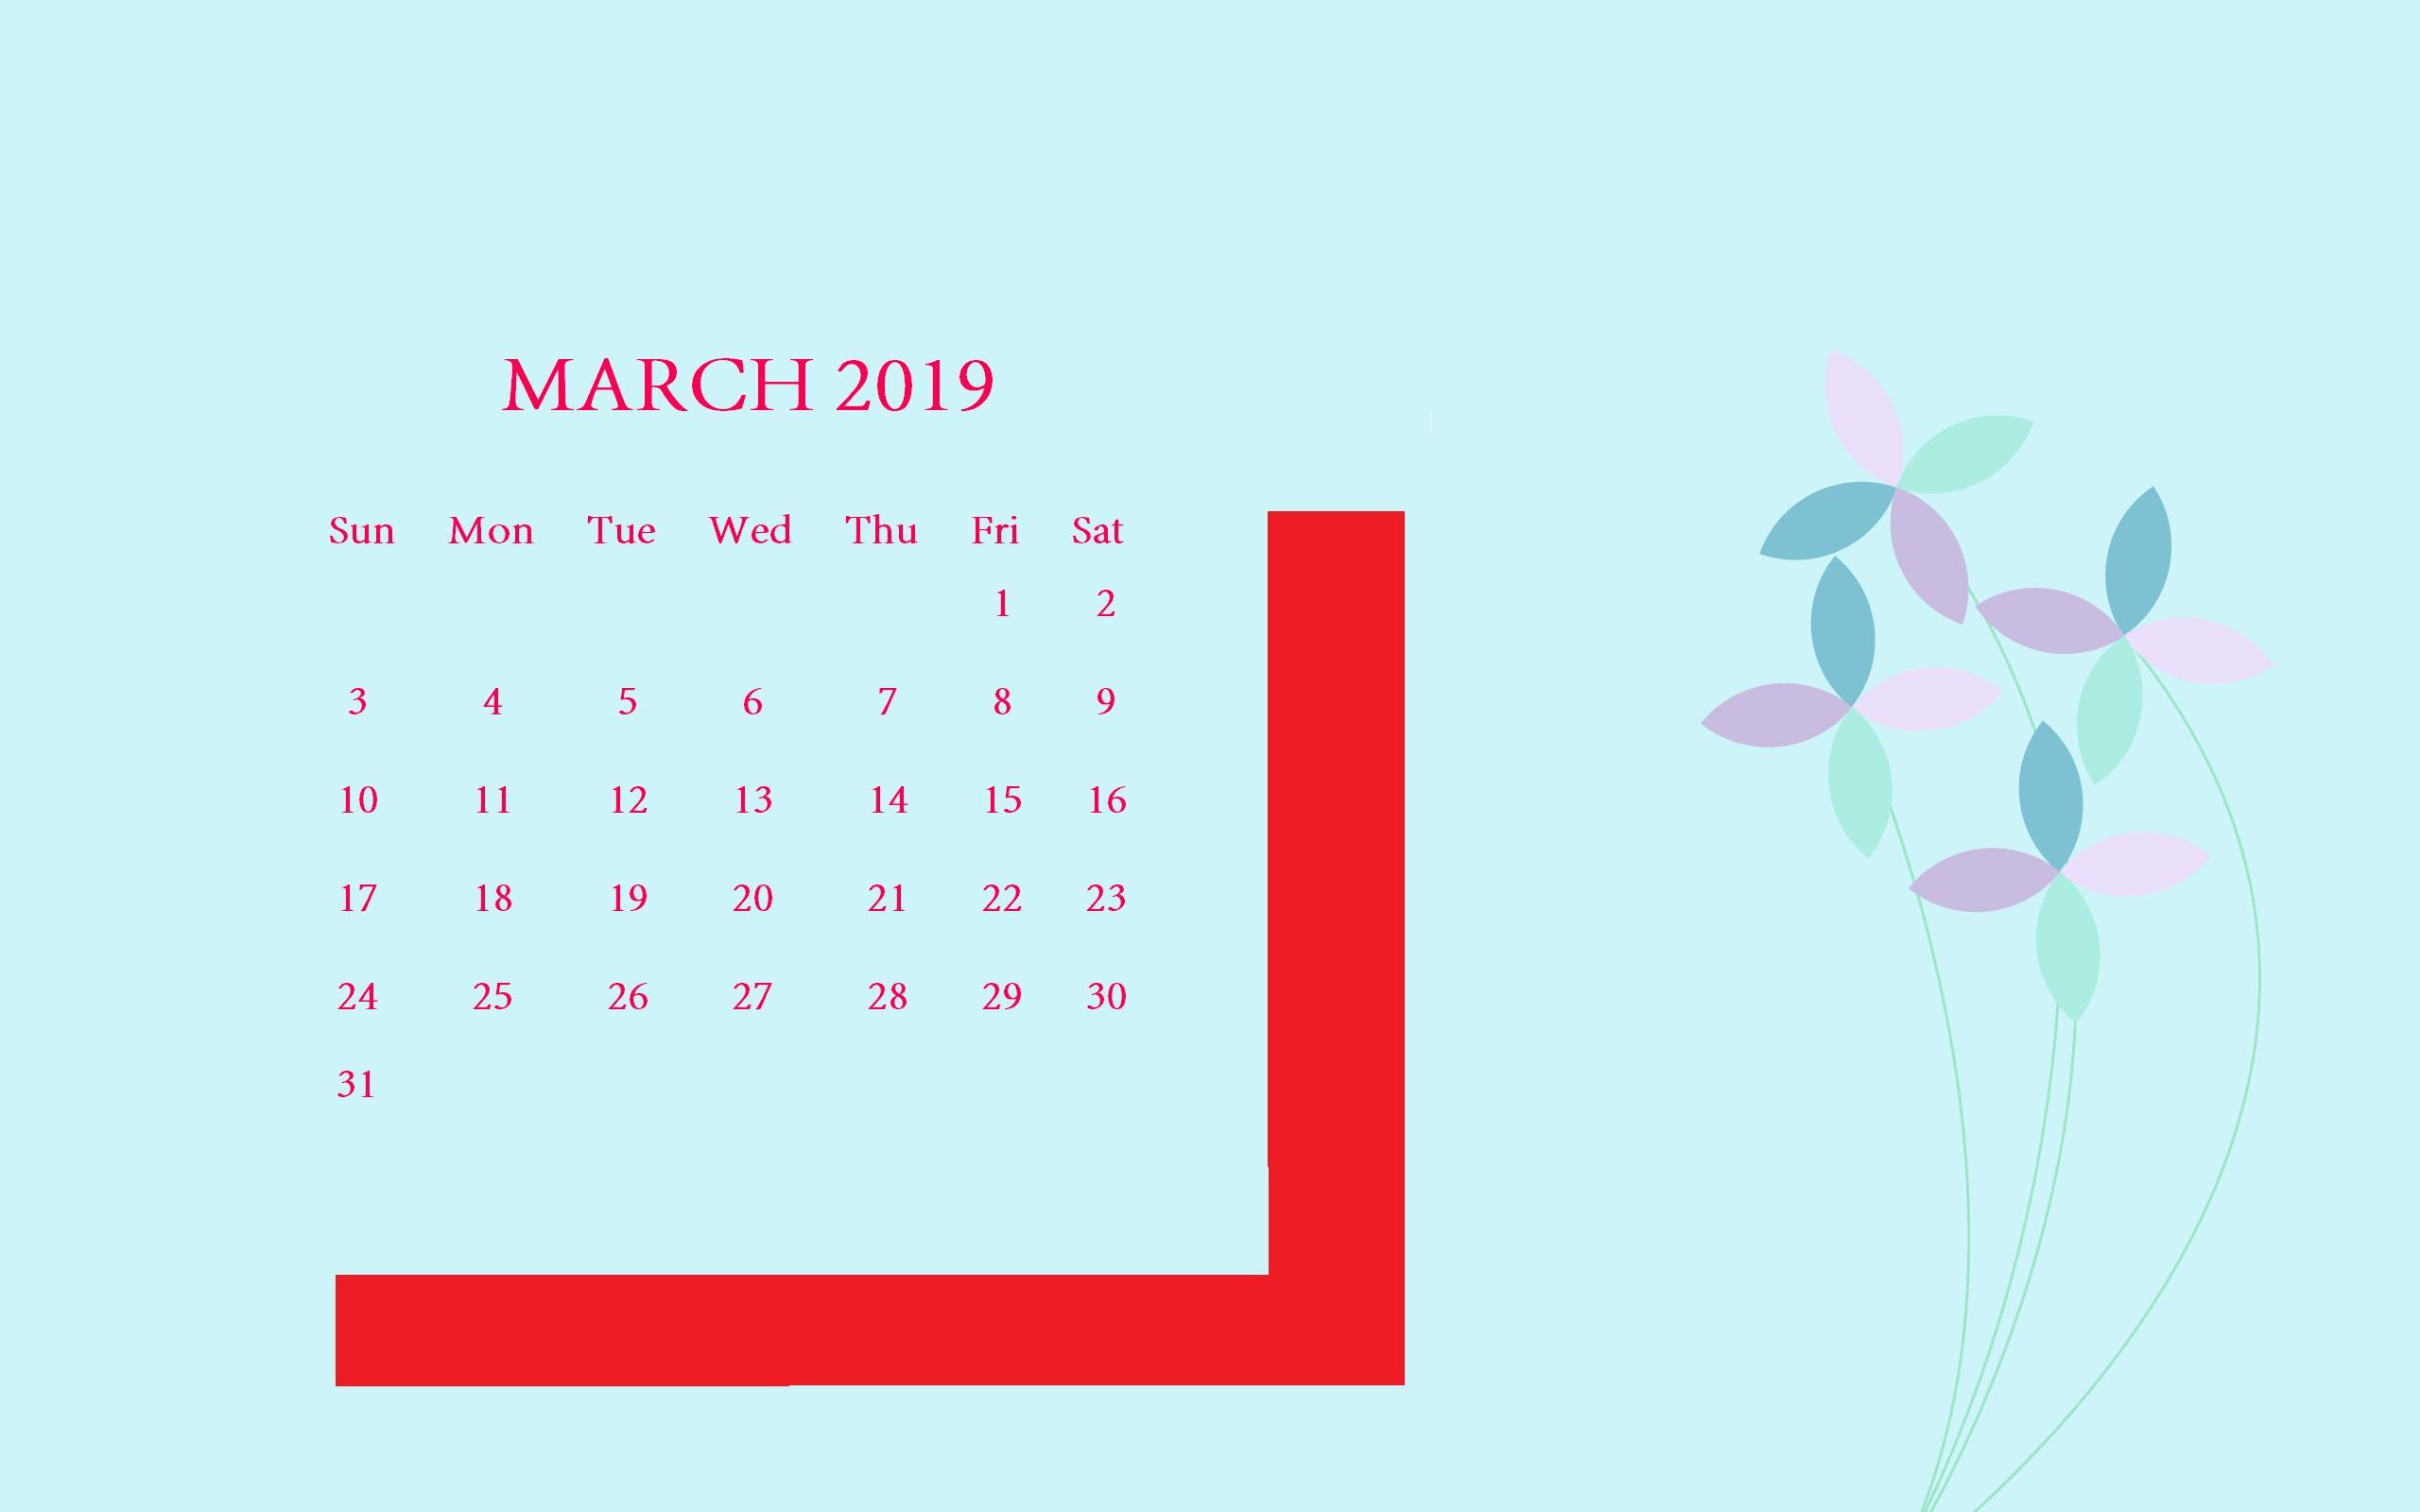 2019 March Calendar Malaysia Más Arriba-a-fecha Flowers March 2019 Desktop Calendar March March2019 Of 2019 March Calendar Malaysia Más Caliente Cute Printable Calendar 2019